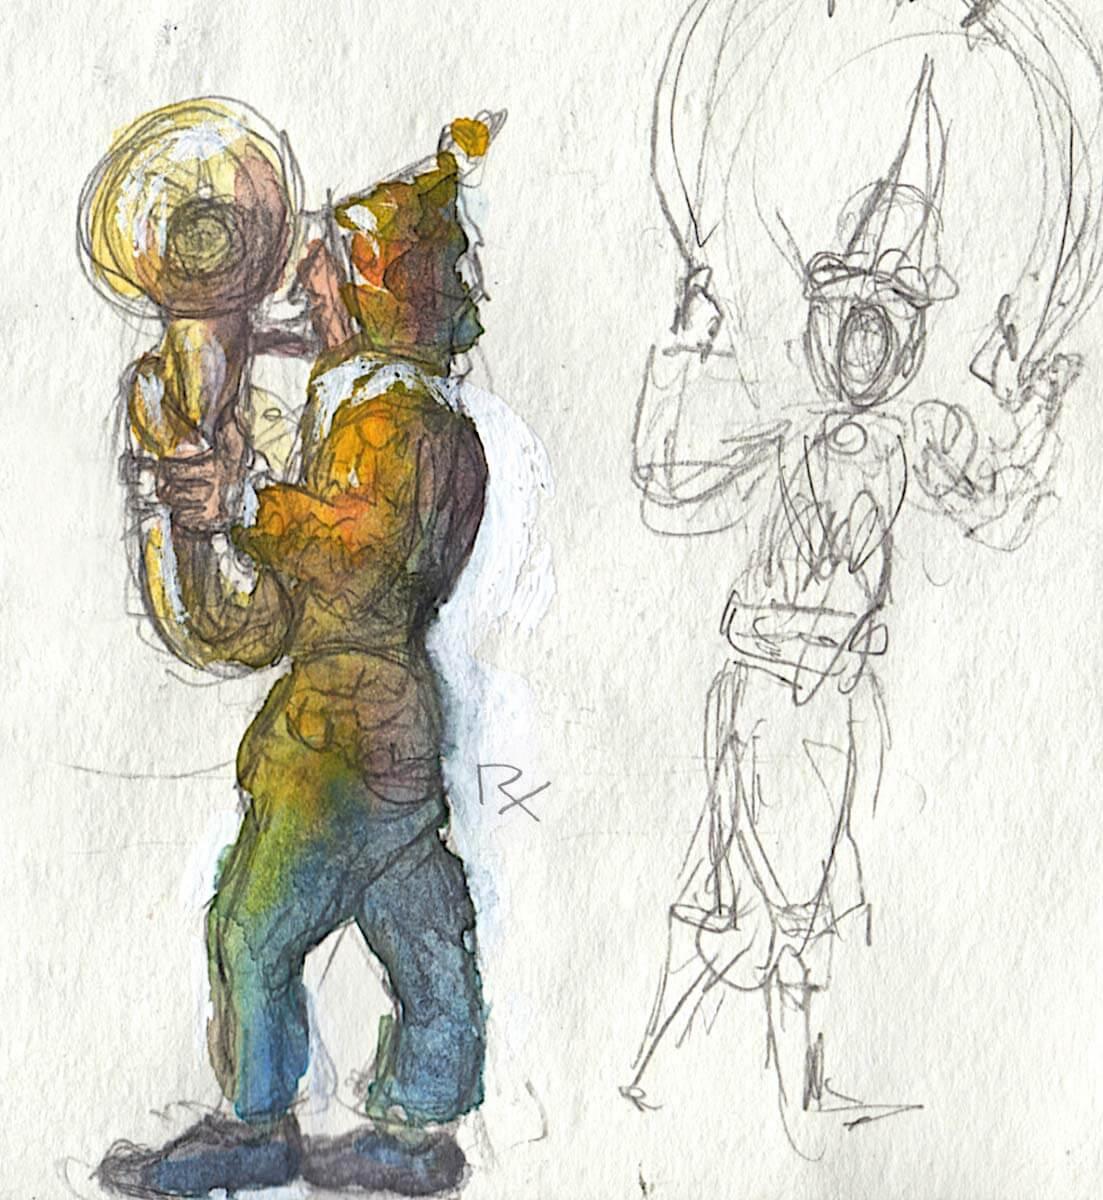 Maschkera-Musiker